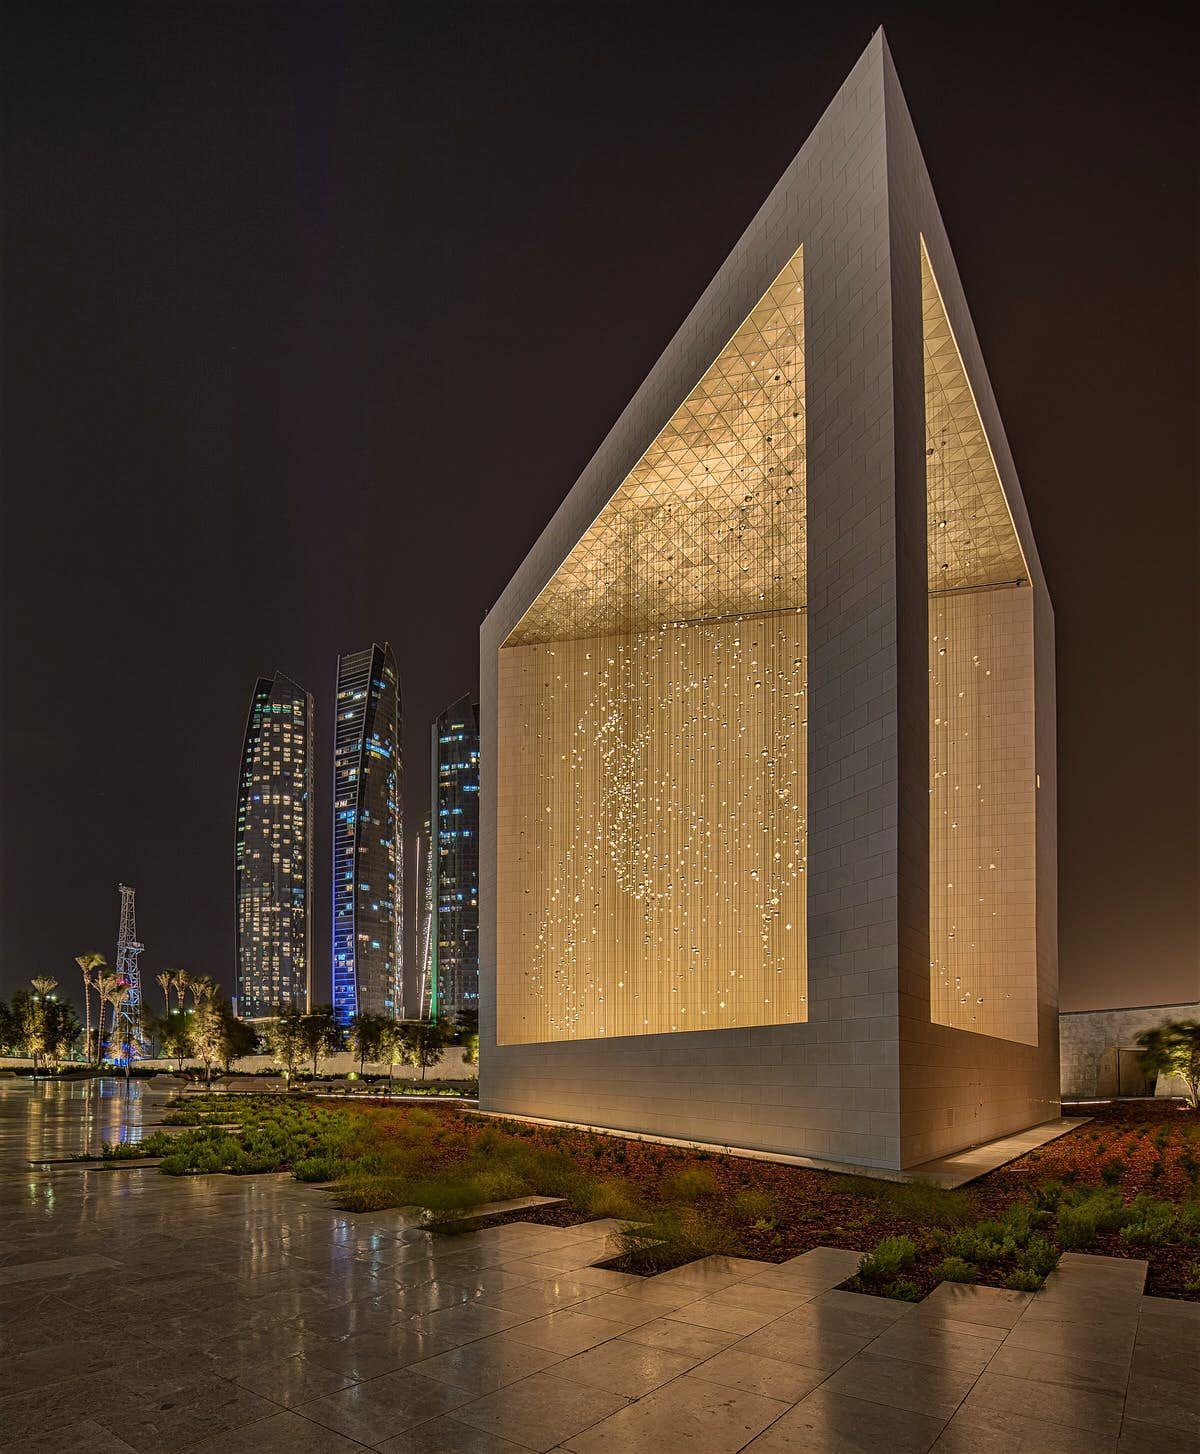 29 Free Things To Do In Abu Dhabi Free Things To Do Abu Dhabi Sheikh Zayed Grand Mosque